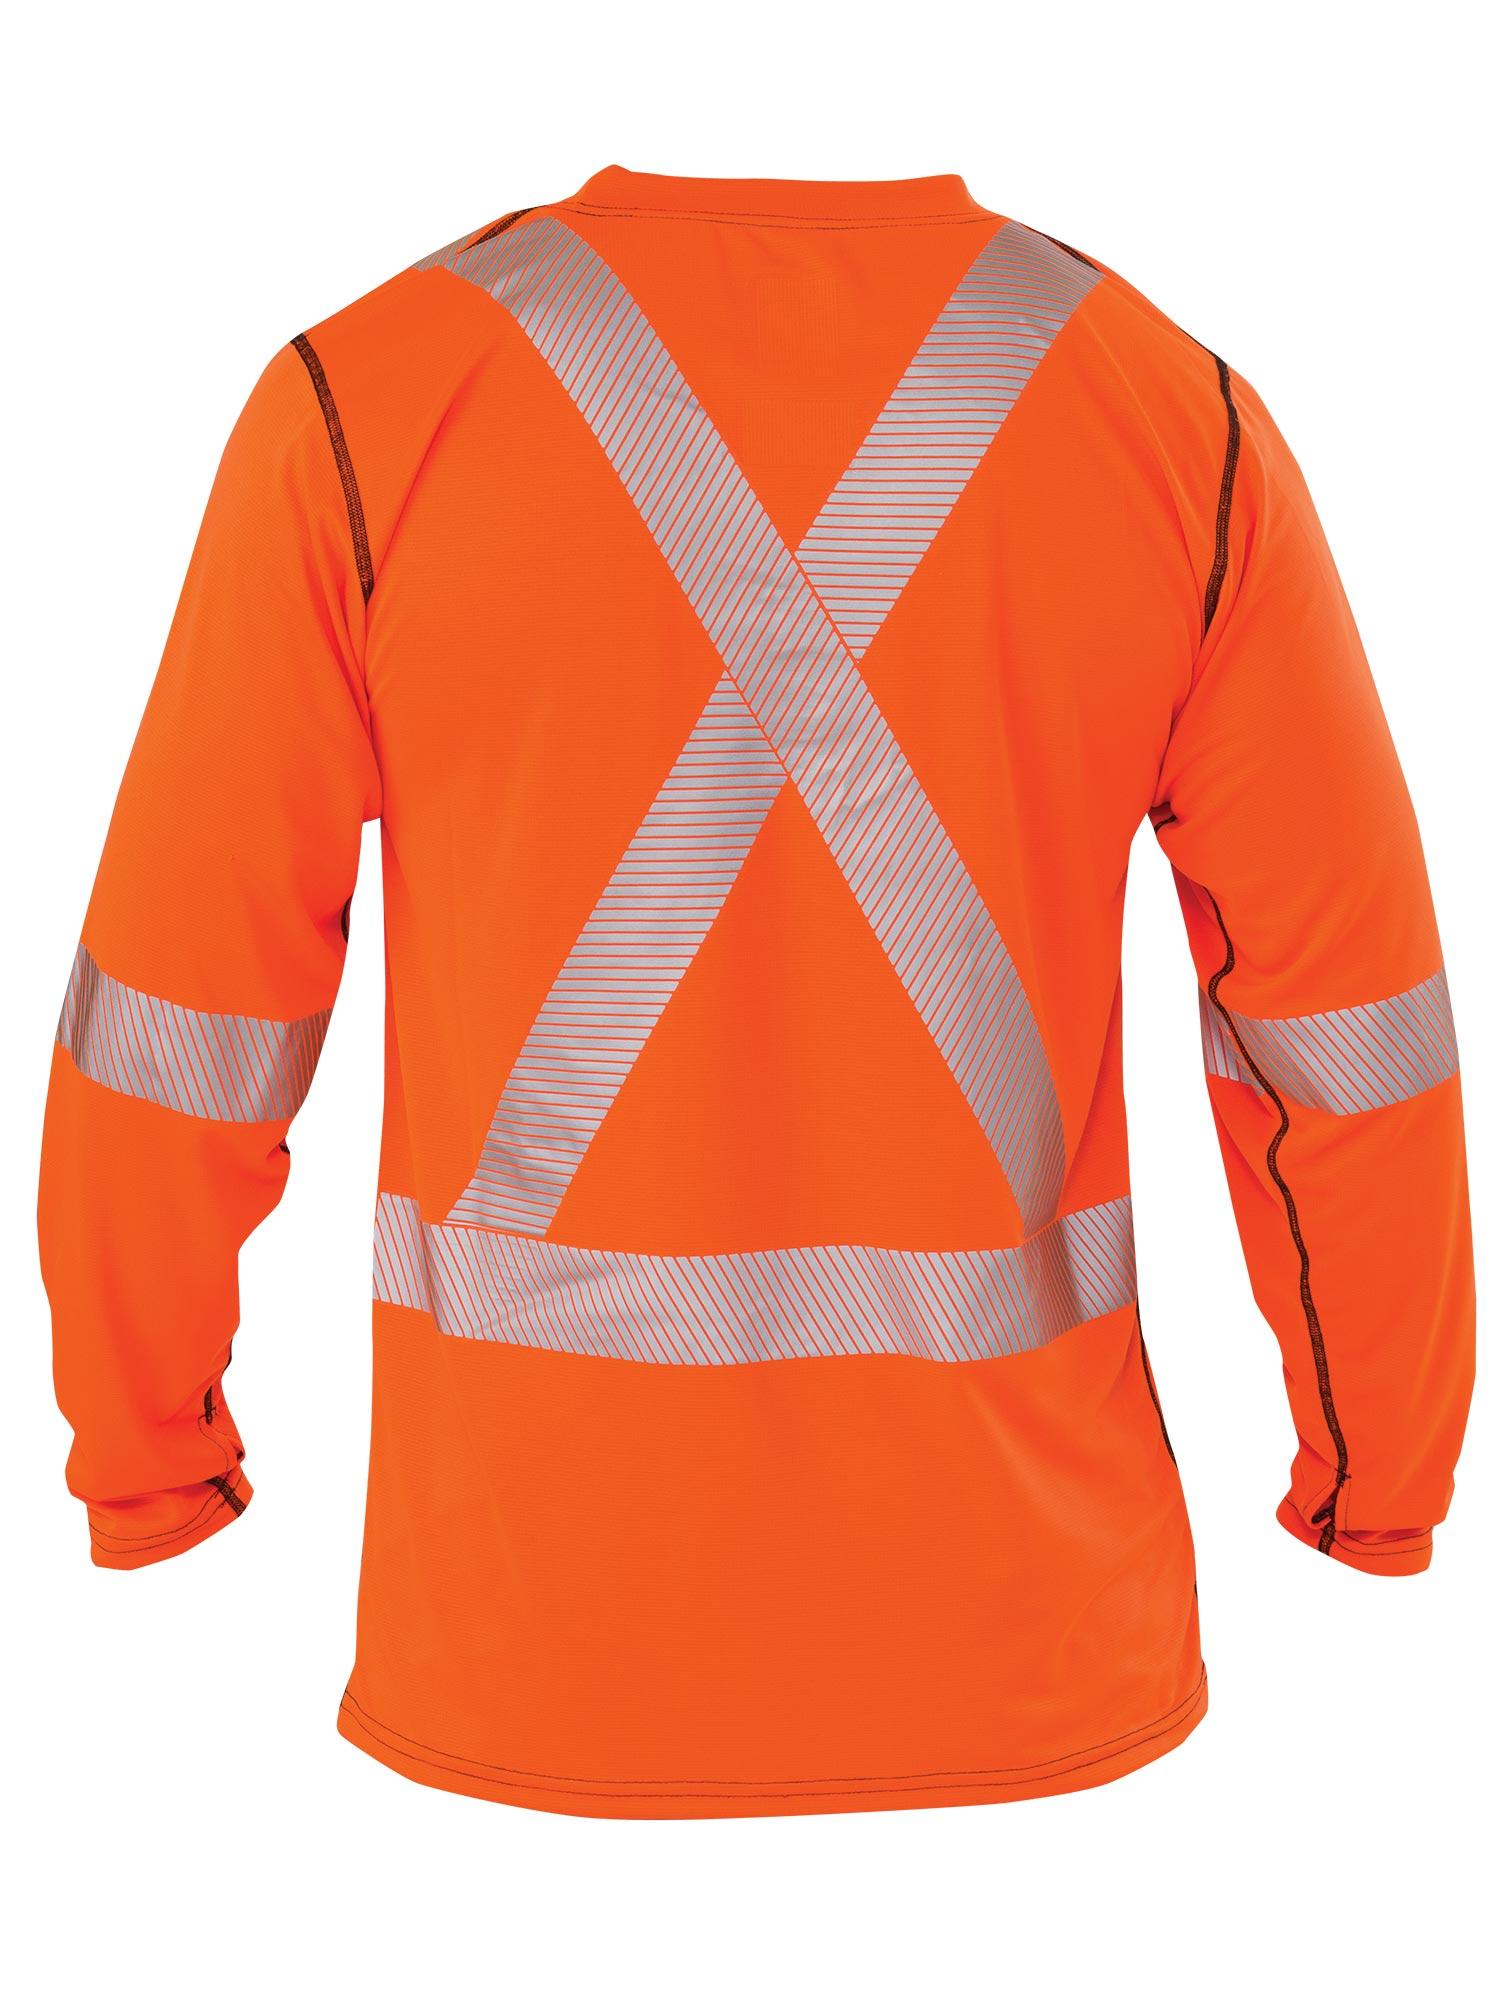 Big bill t shirt manches longues hv powerdry rt55hvk5 for 6 dollar shirts coupon code free shipping